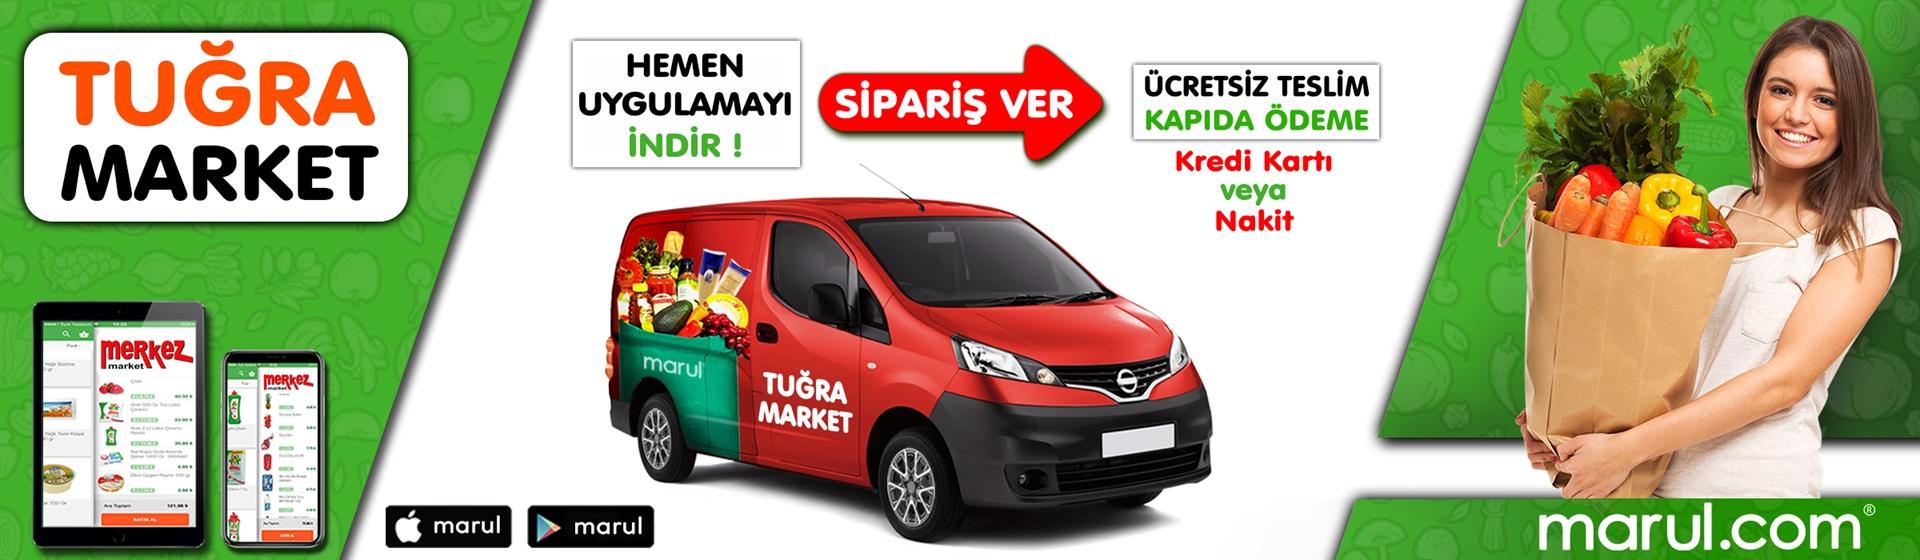 samsun atakum tuğra market online market alışverişi